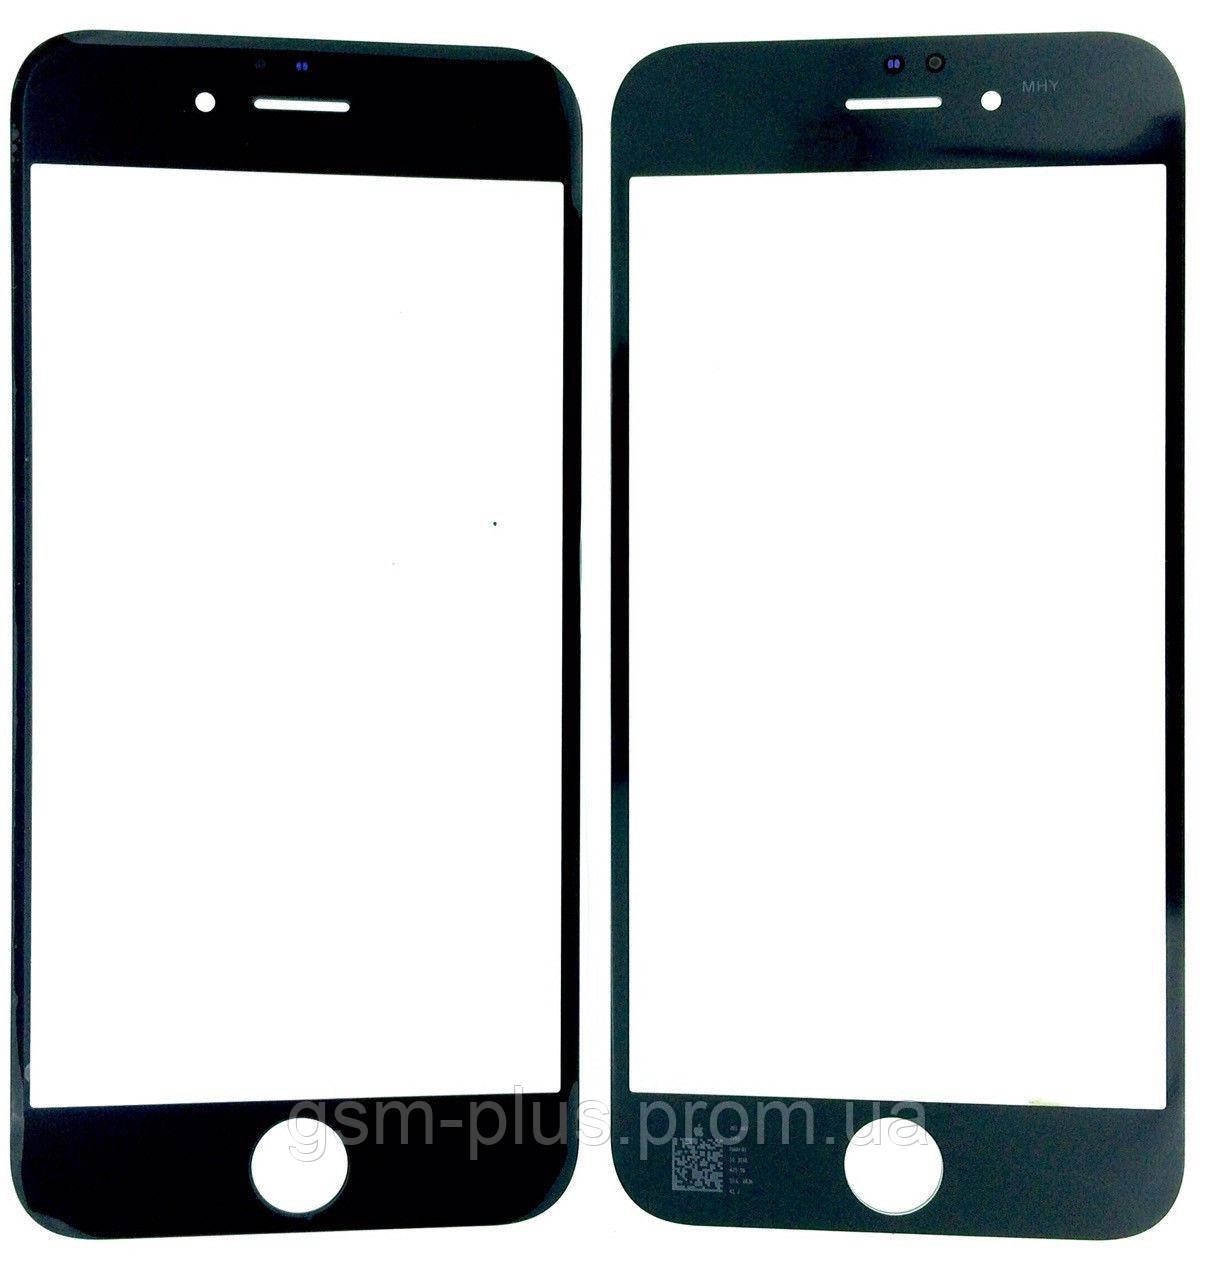 Стекло дисплея iphone 6s (4.7) black (для переклейки) or